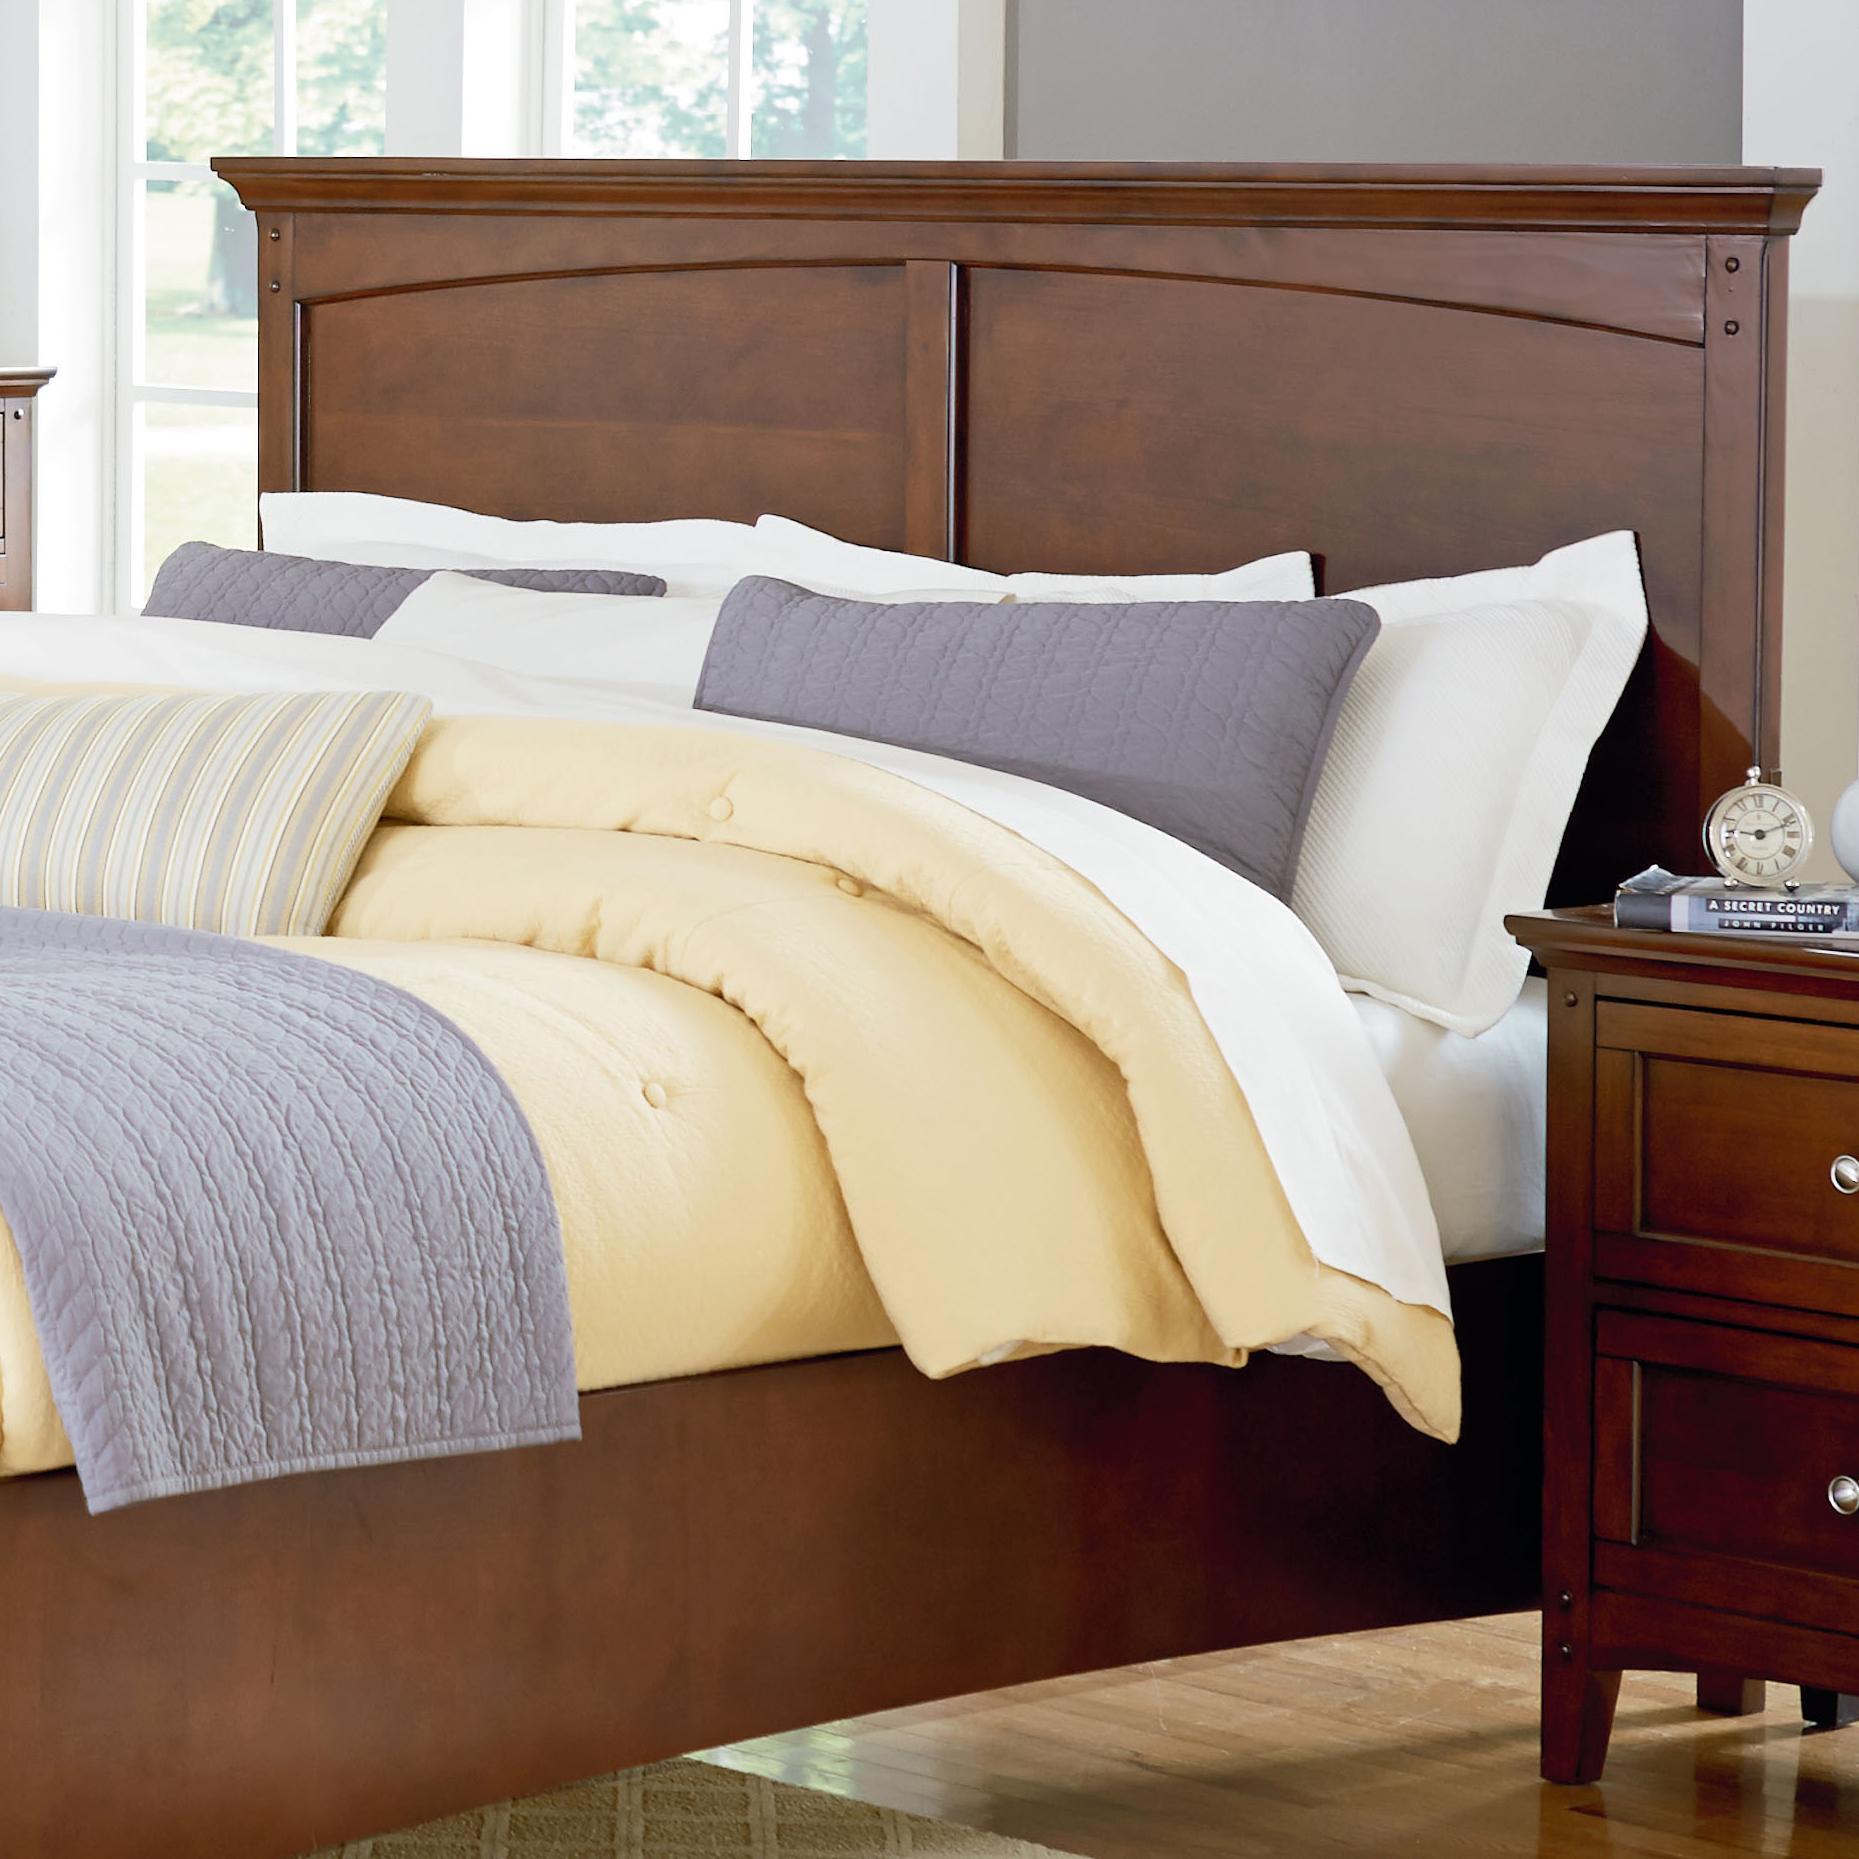 Standard Furniture Cooperstown King Panel Headboard - Item Number: 93811